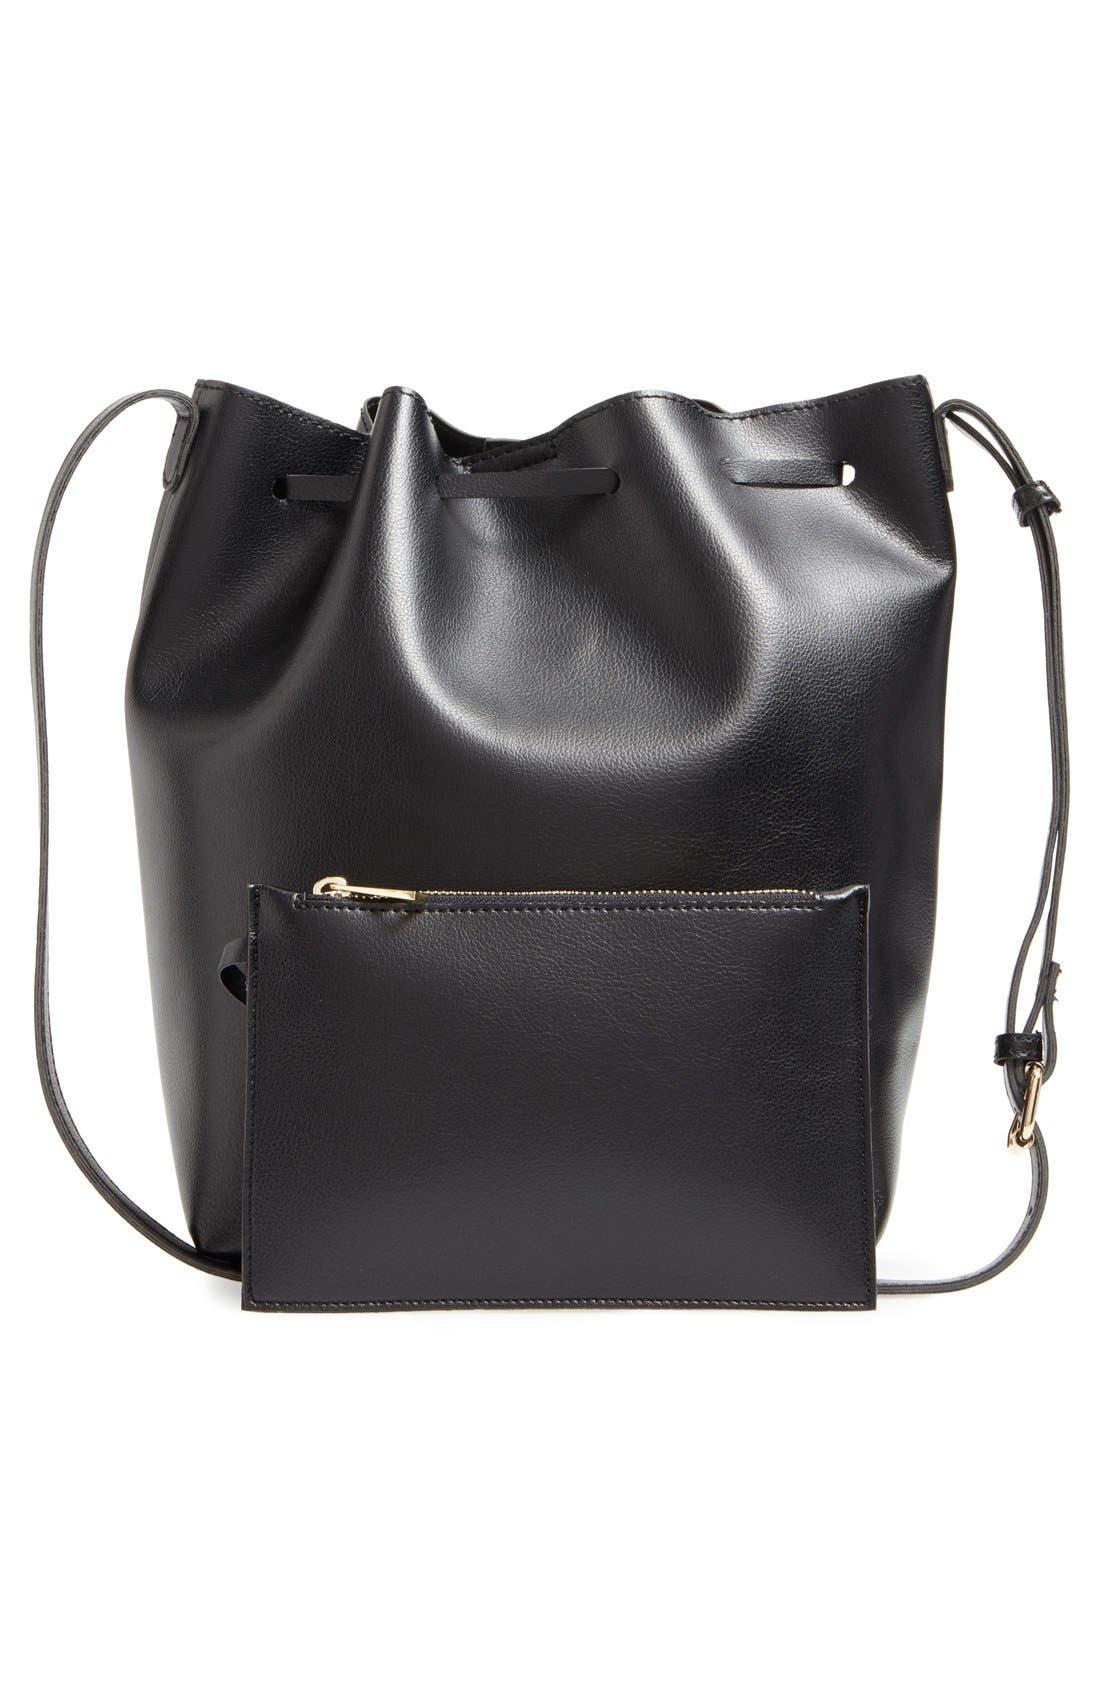 SOLE SOCIETY,                             'Blackwood' Faux Leather Bucket Bag,                             Alternate thumbnail 3, color,                             001